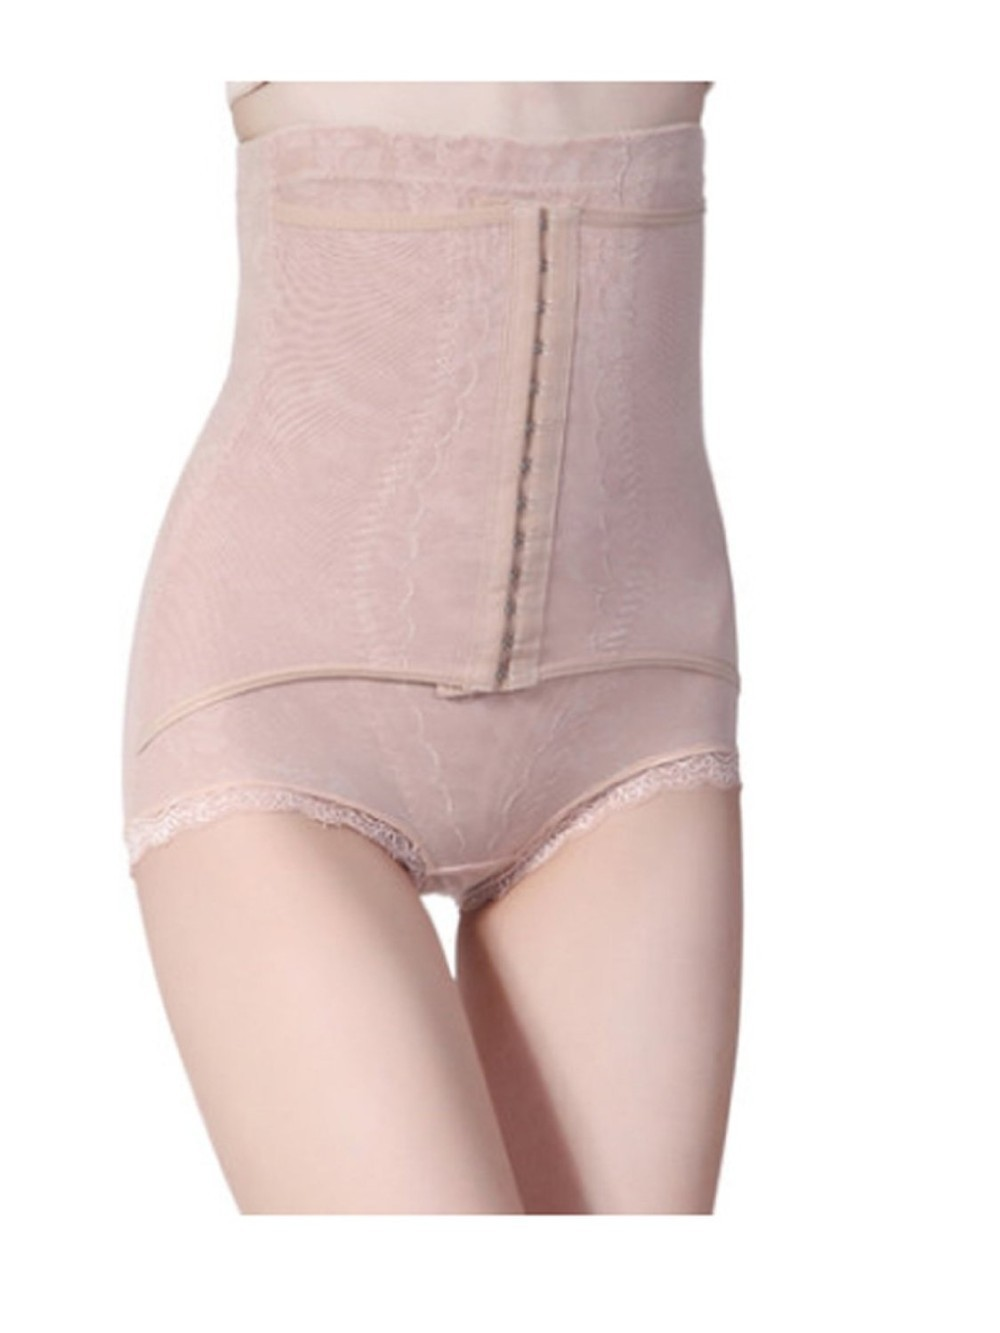 Корректирующие женские шортики ONECASE